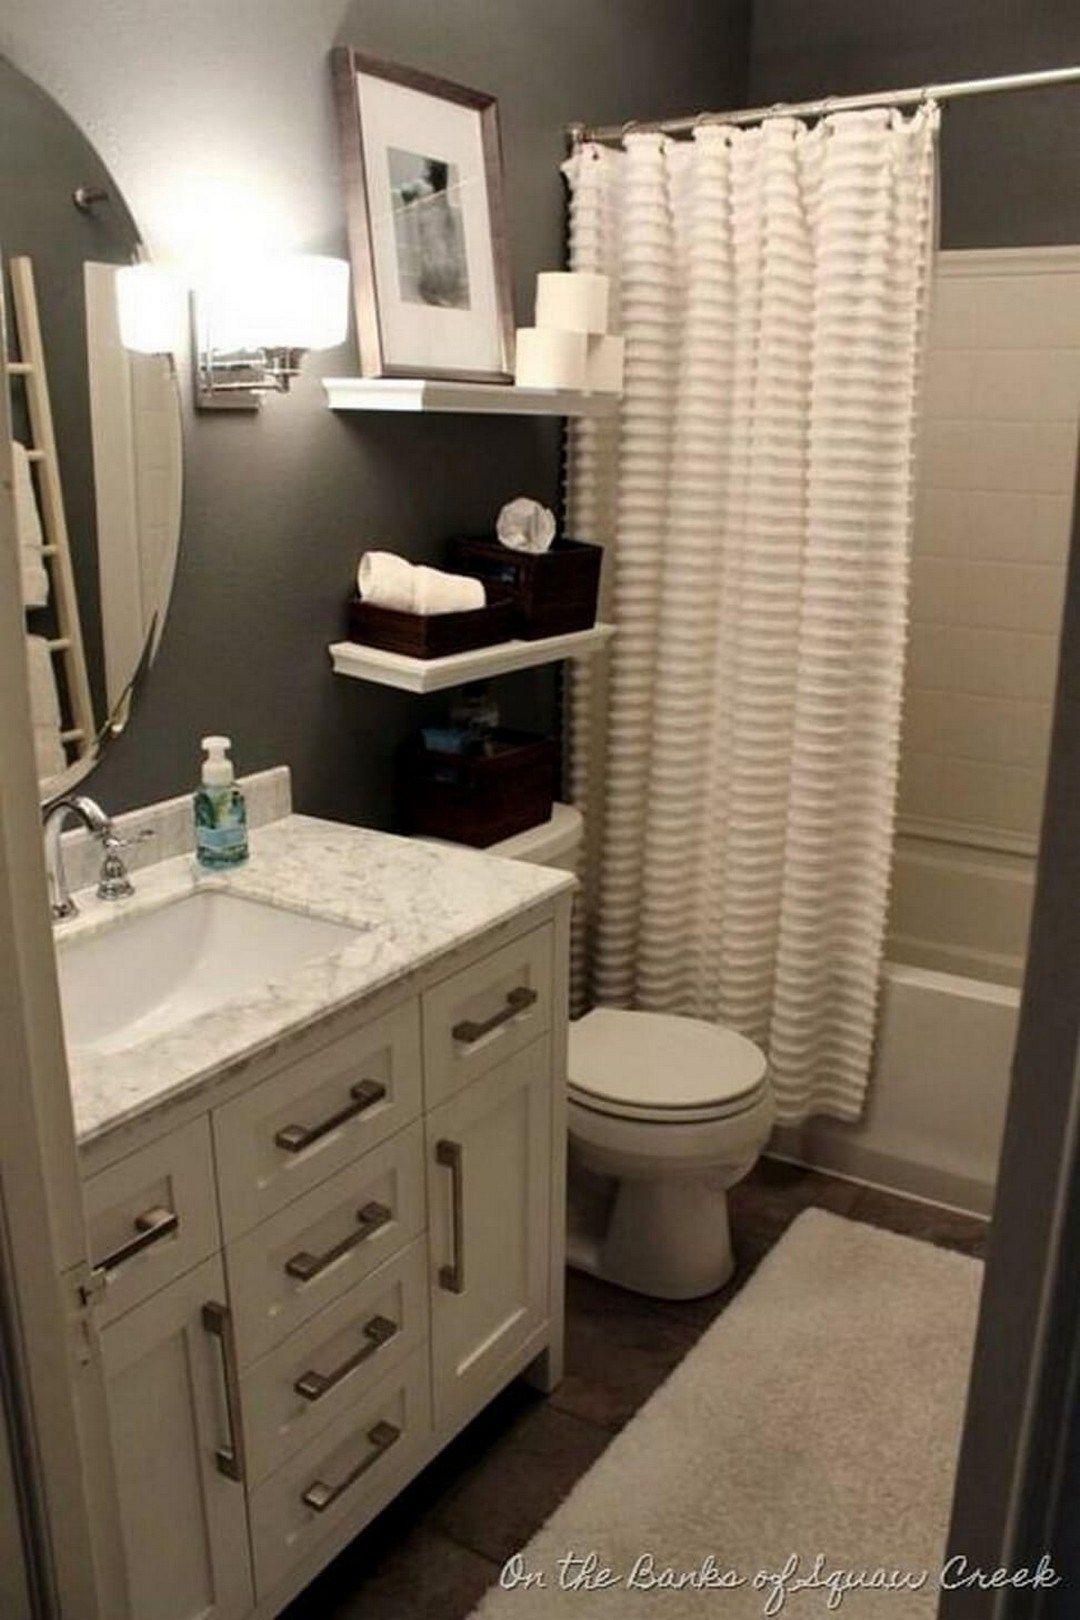 32 Inspiring Small Bathroom Design Ideas That Create A Special Attraction For Your Pleasure Goodnewsarchitecture Small Bathroom Decor Small Bathroom Bathroom Decor